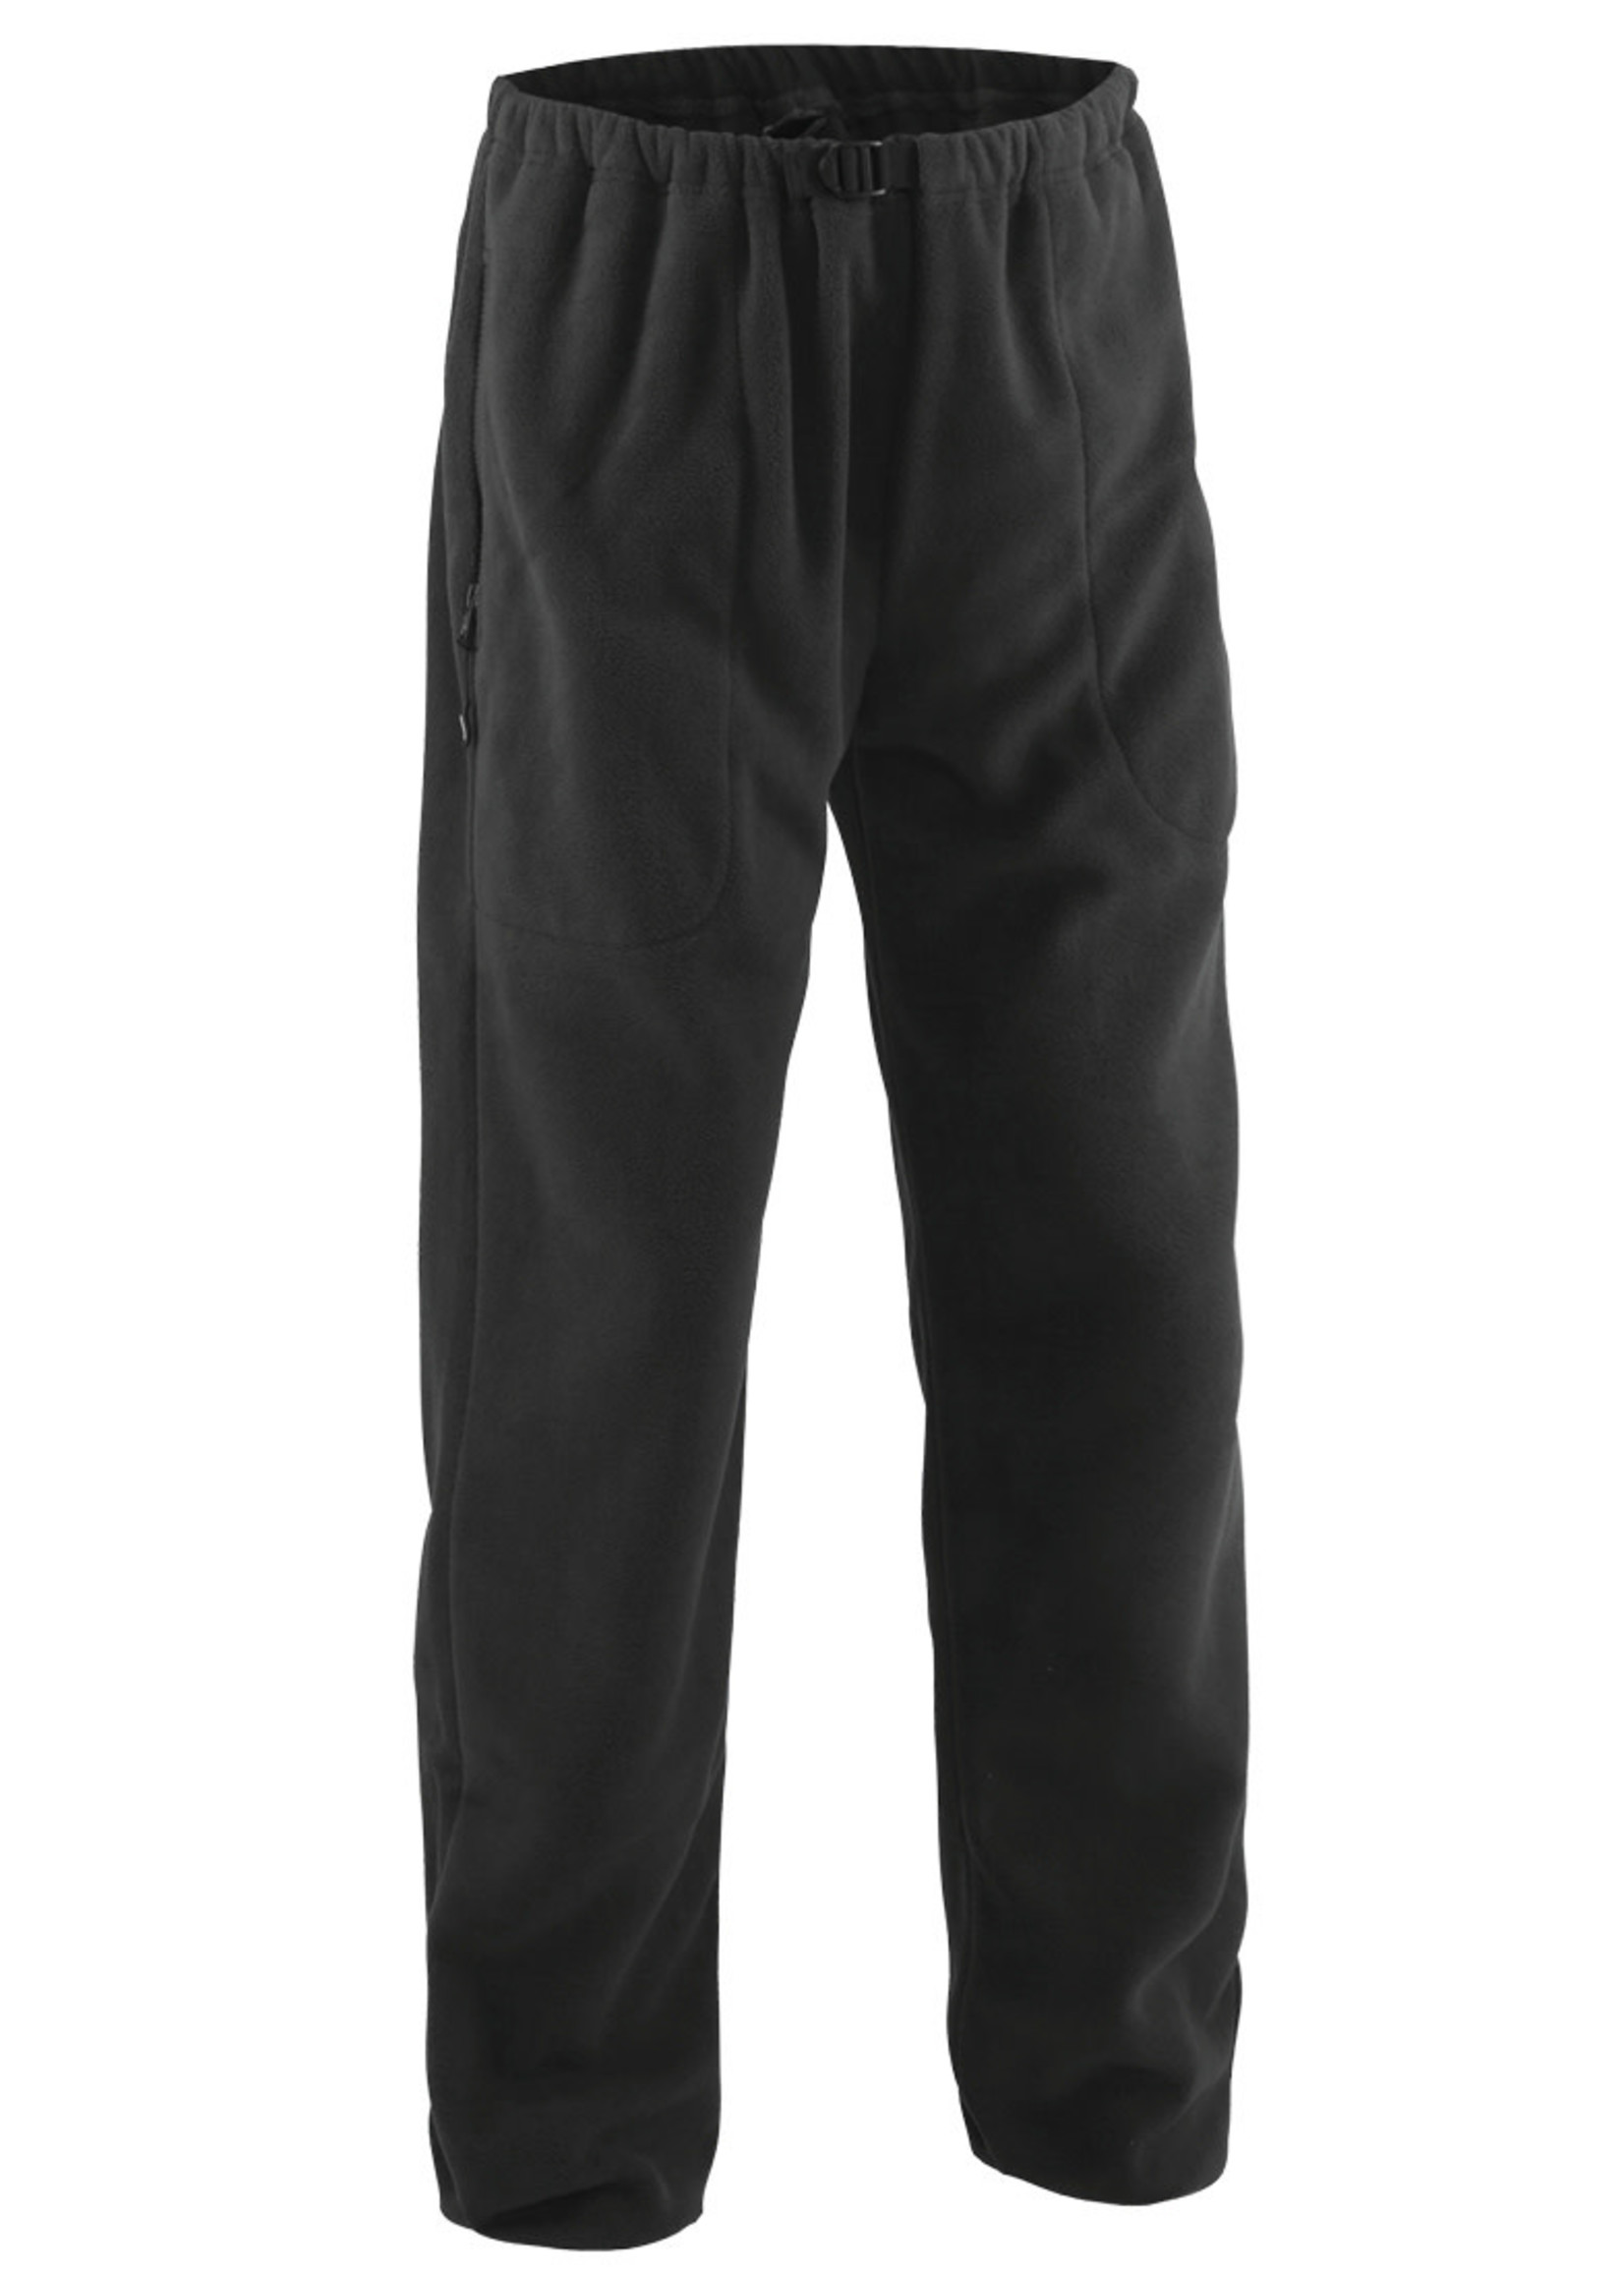 GRUNDENS USA, LTD. Grundens Black Fleece Pant